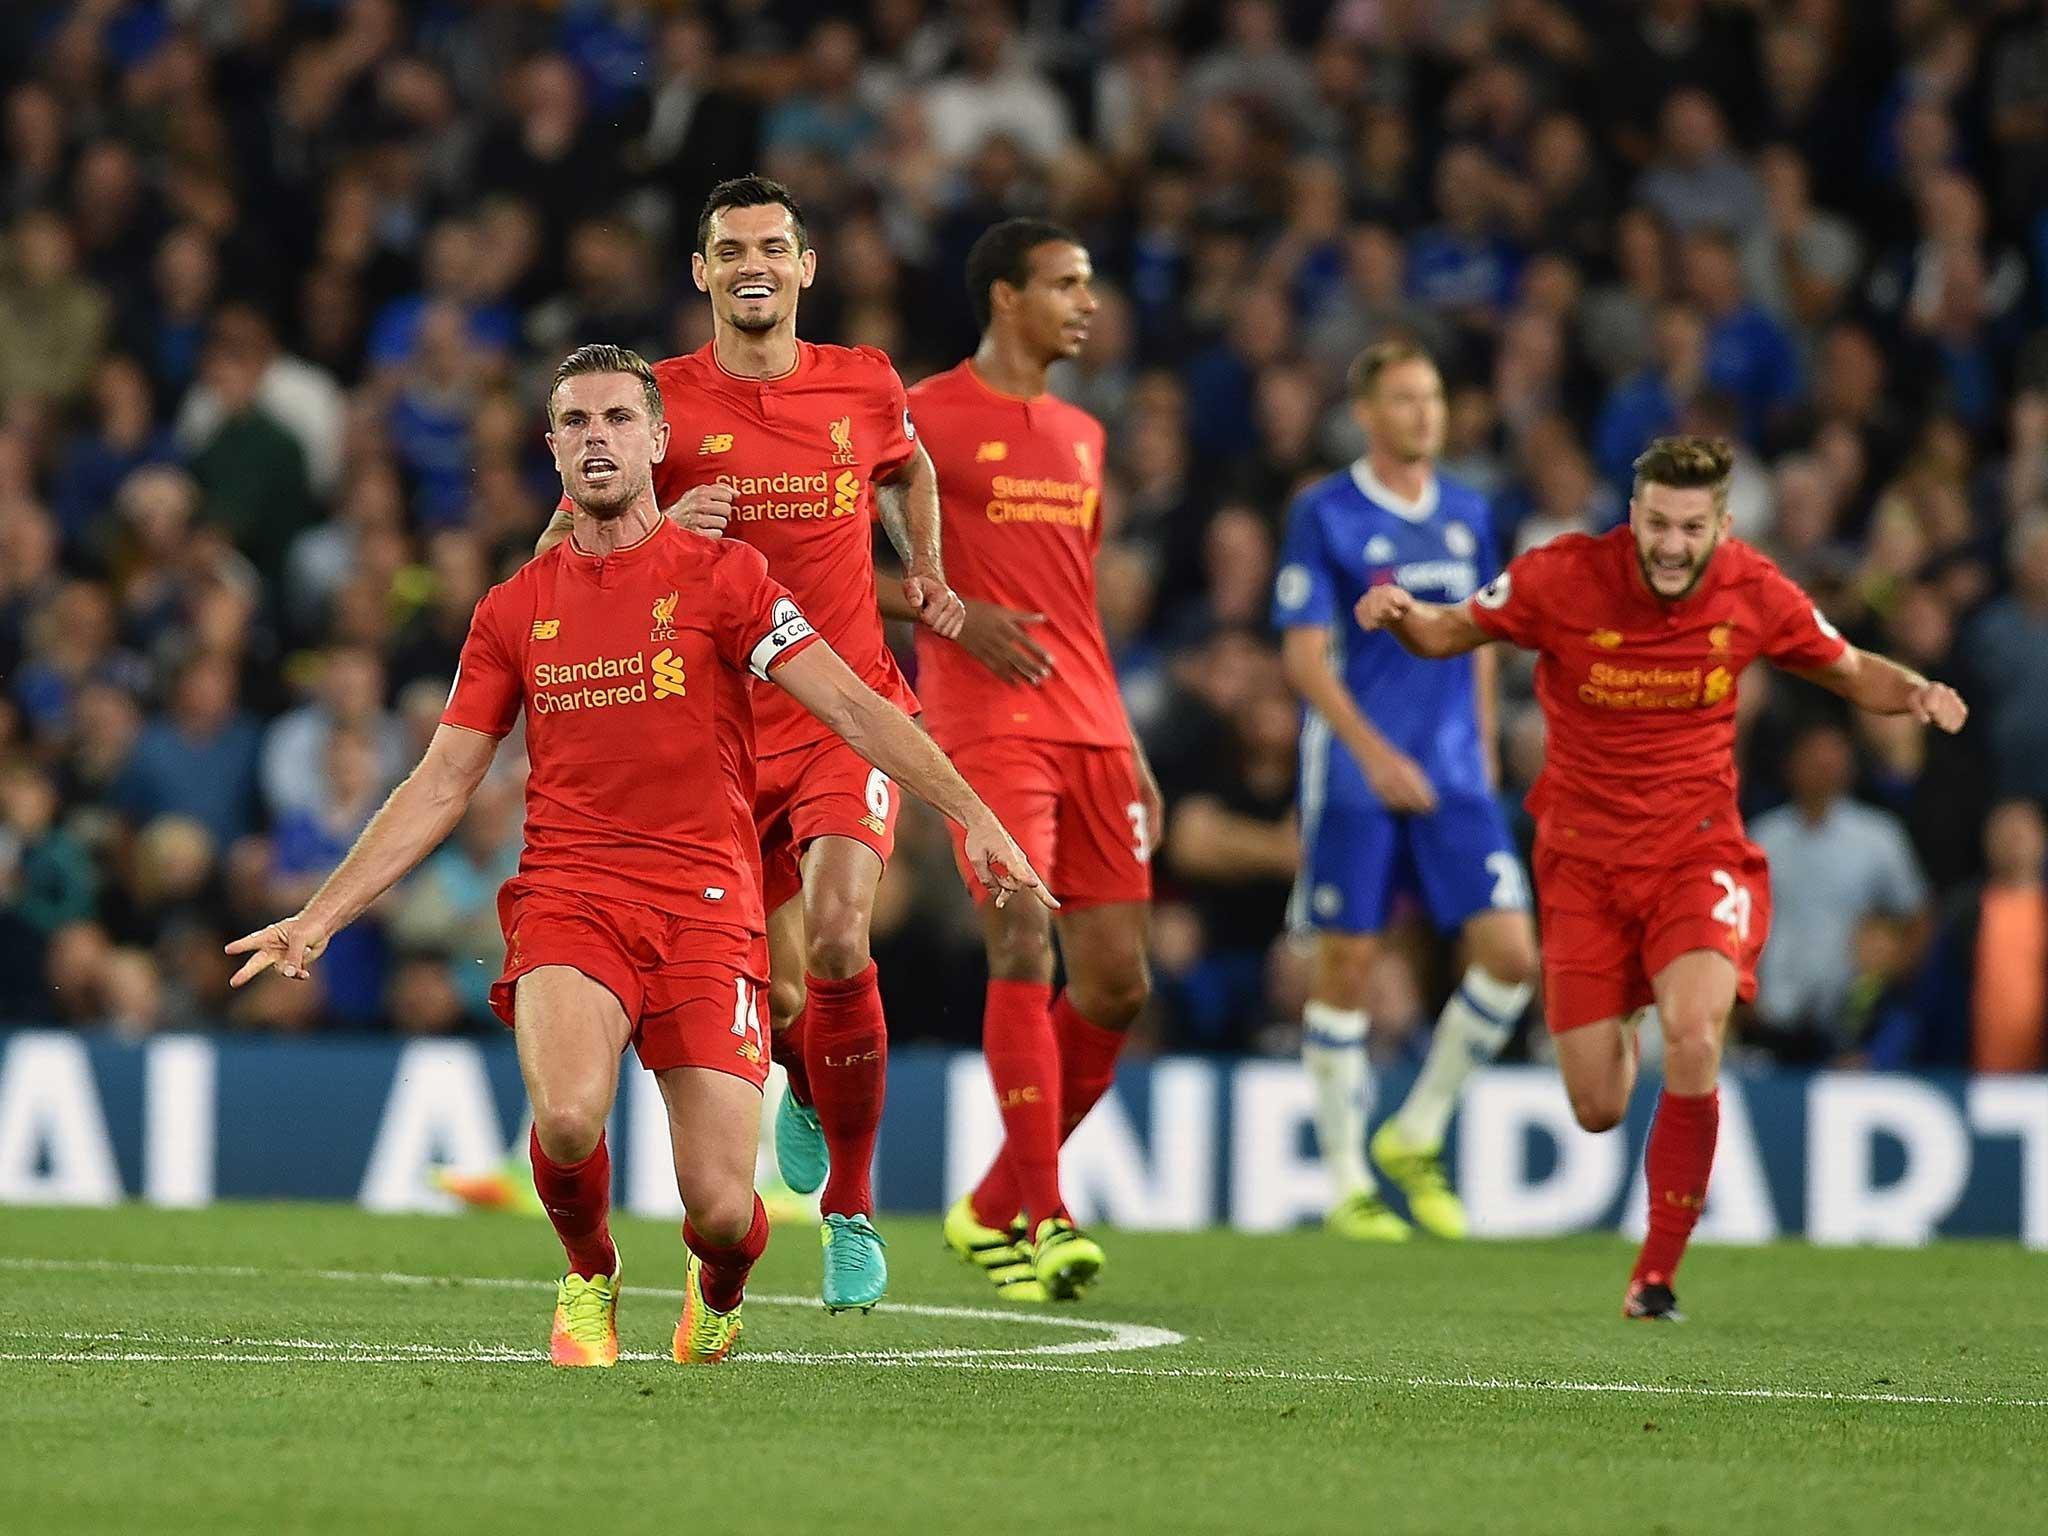 Chelsea Vs Liverpool Match Report: Dejan Lovren And Jordan